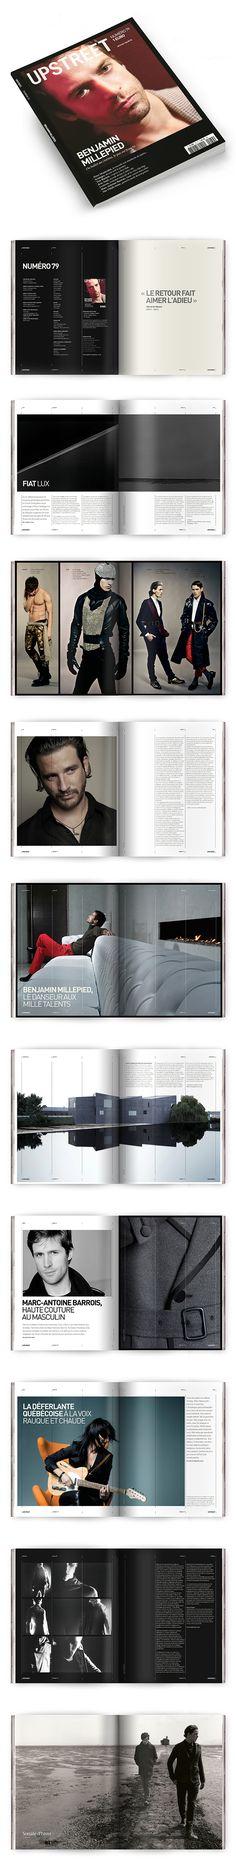 Upstreet Magazine: Men's Fashion, Arts & Culture // via Behance – fashion editorial layout Page Layout Design, Web Design, Print Design, Graphic Design, Book Layout, Magazine Page Layouts, Magazine Layout Design, Editorial Layout, Editorial Design